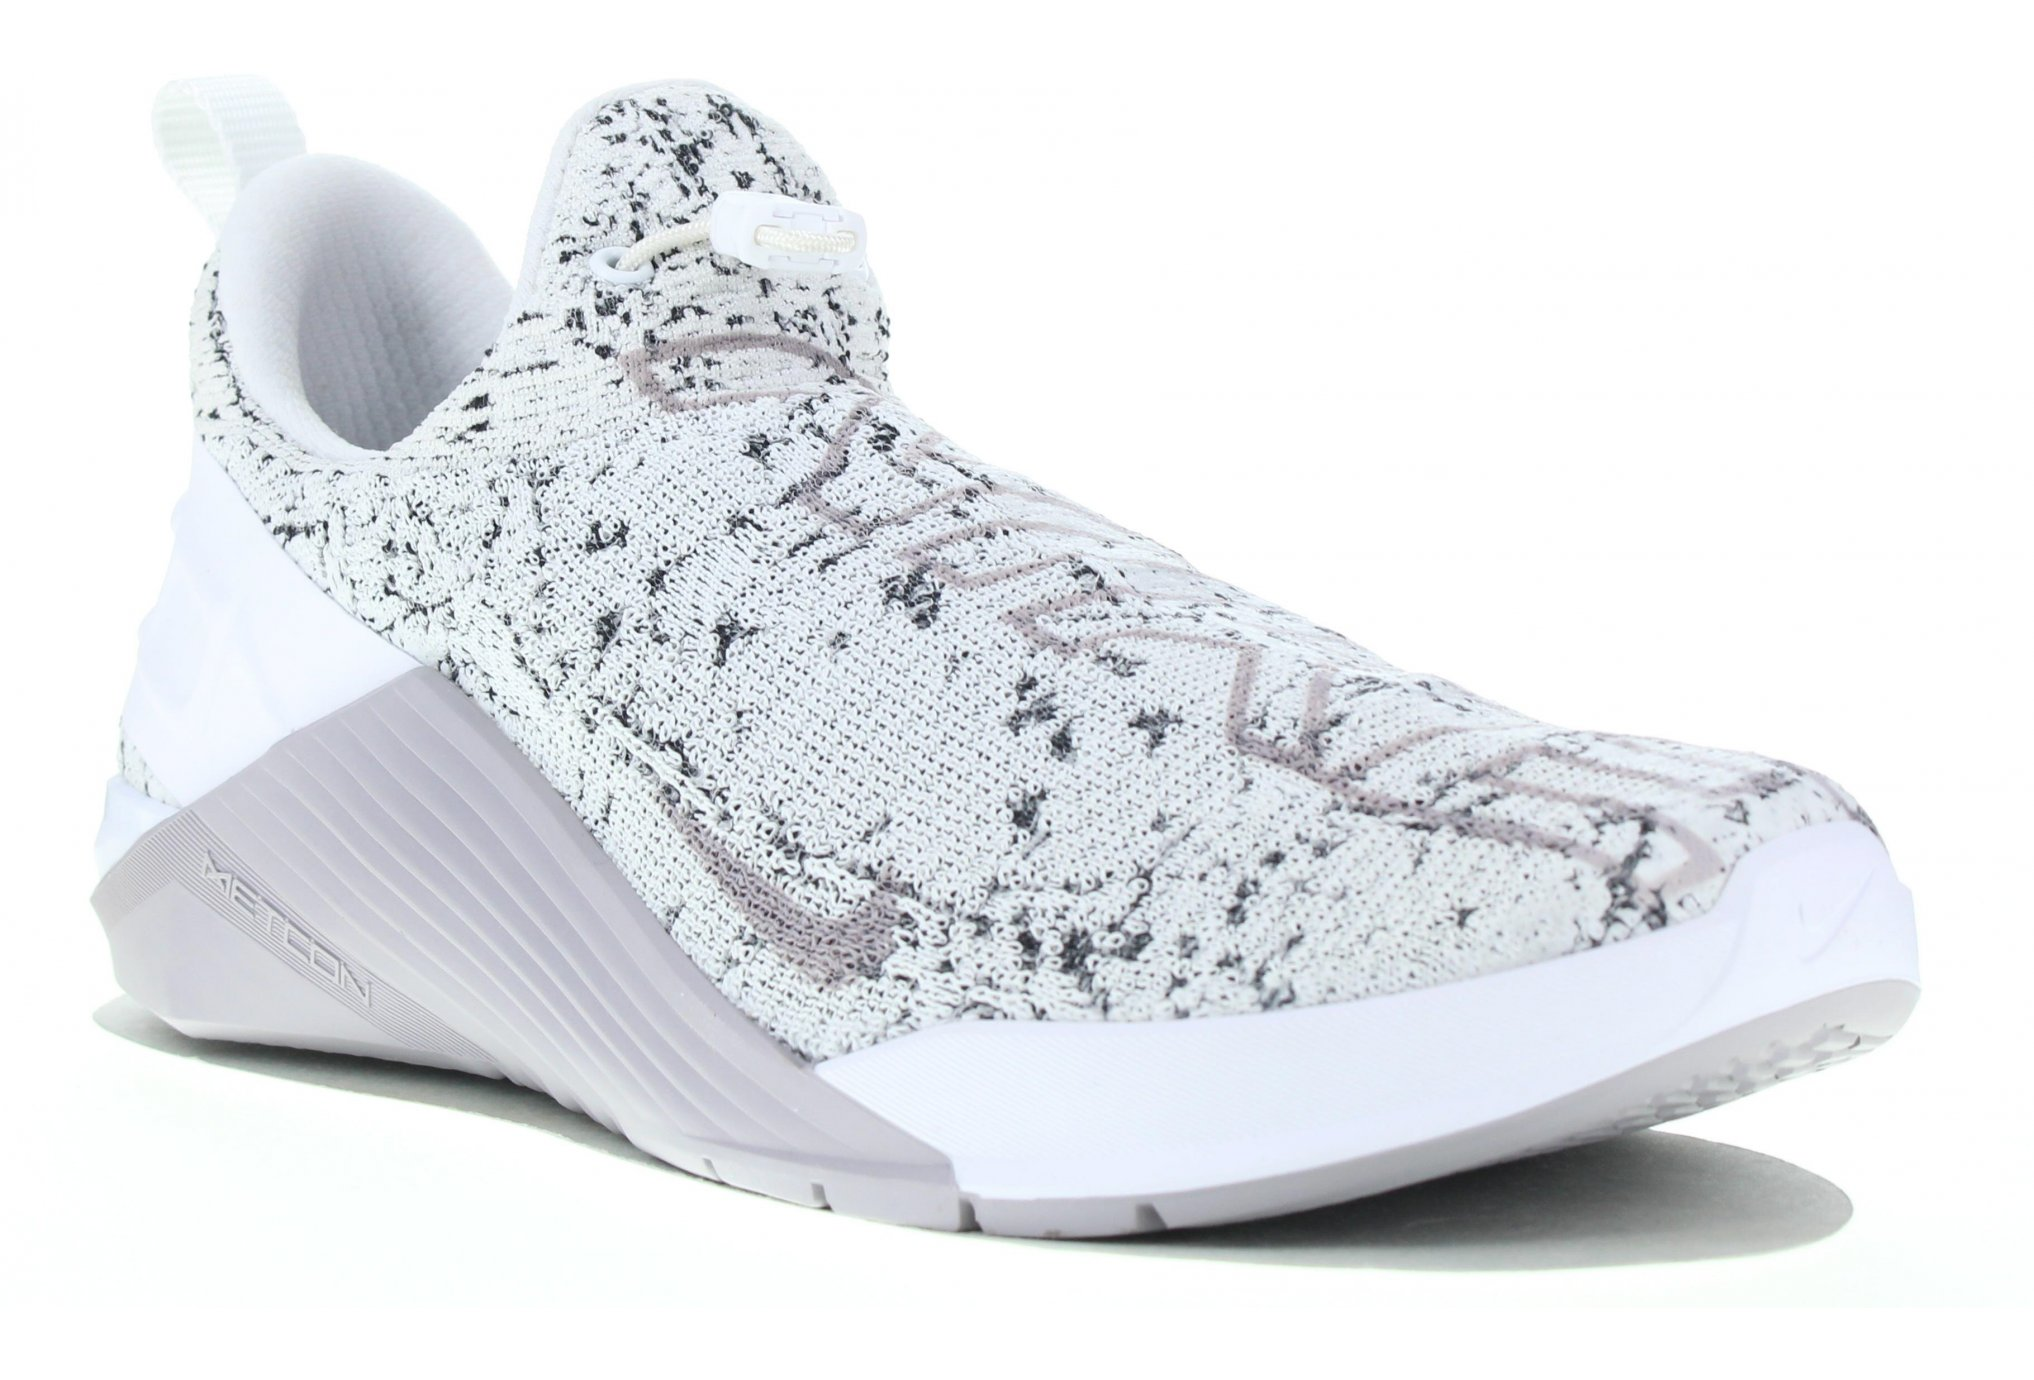 Nike React Metcon W Chaussures running femme